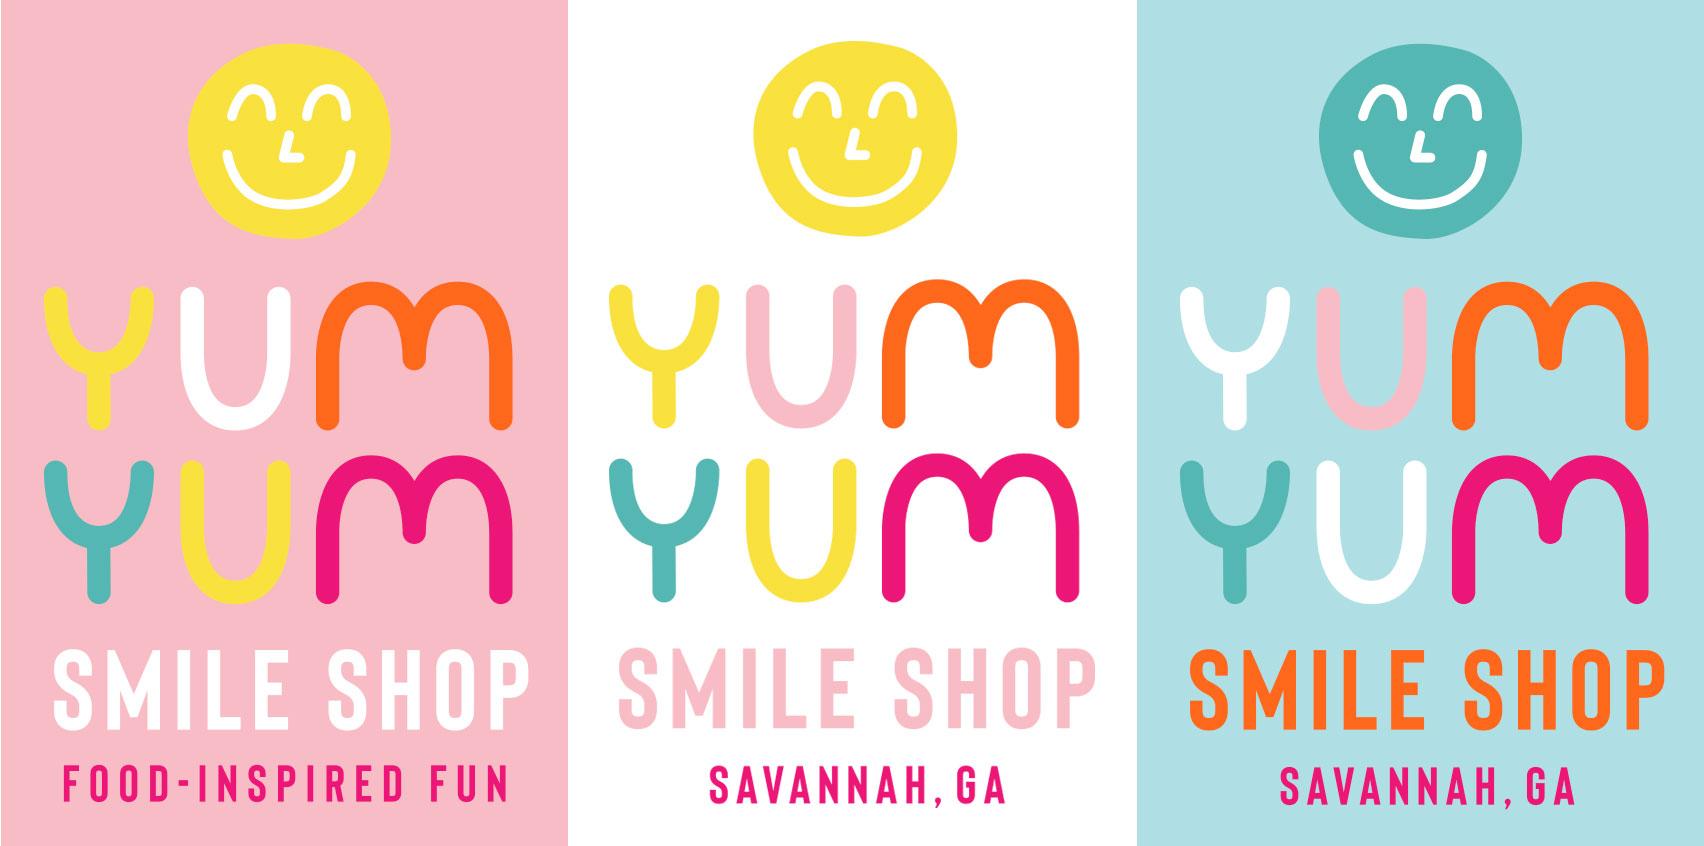 yumyumsmileshop_branding_design_logos.jpg